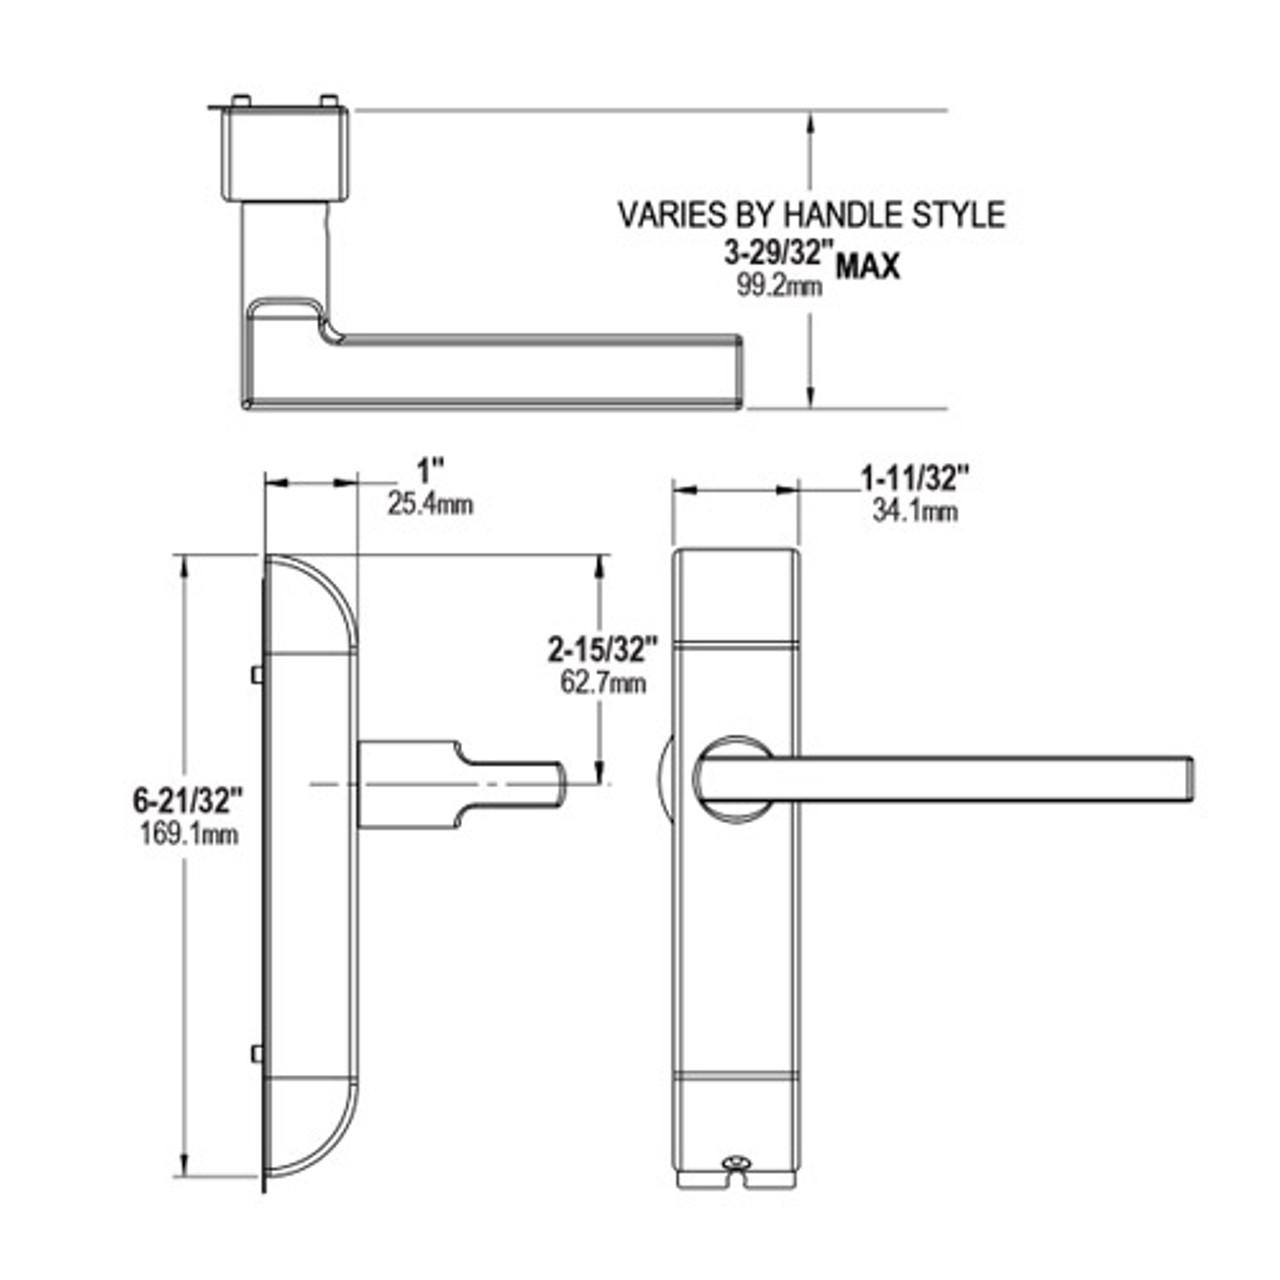 4600-MV-652-US4 Adams Rite MV Designer handle Dimensional View